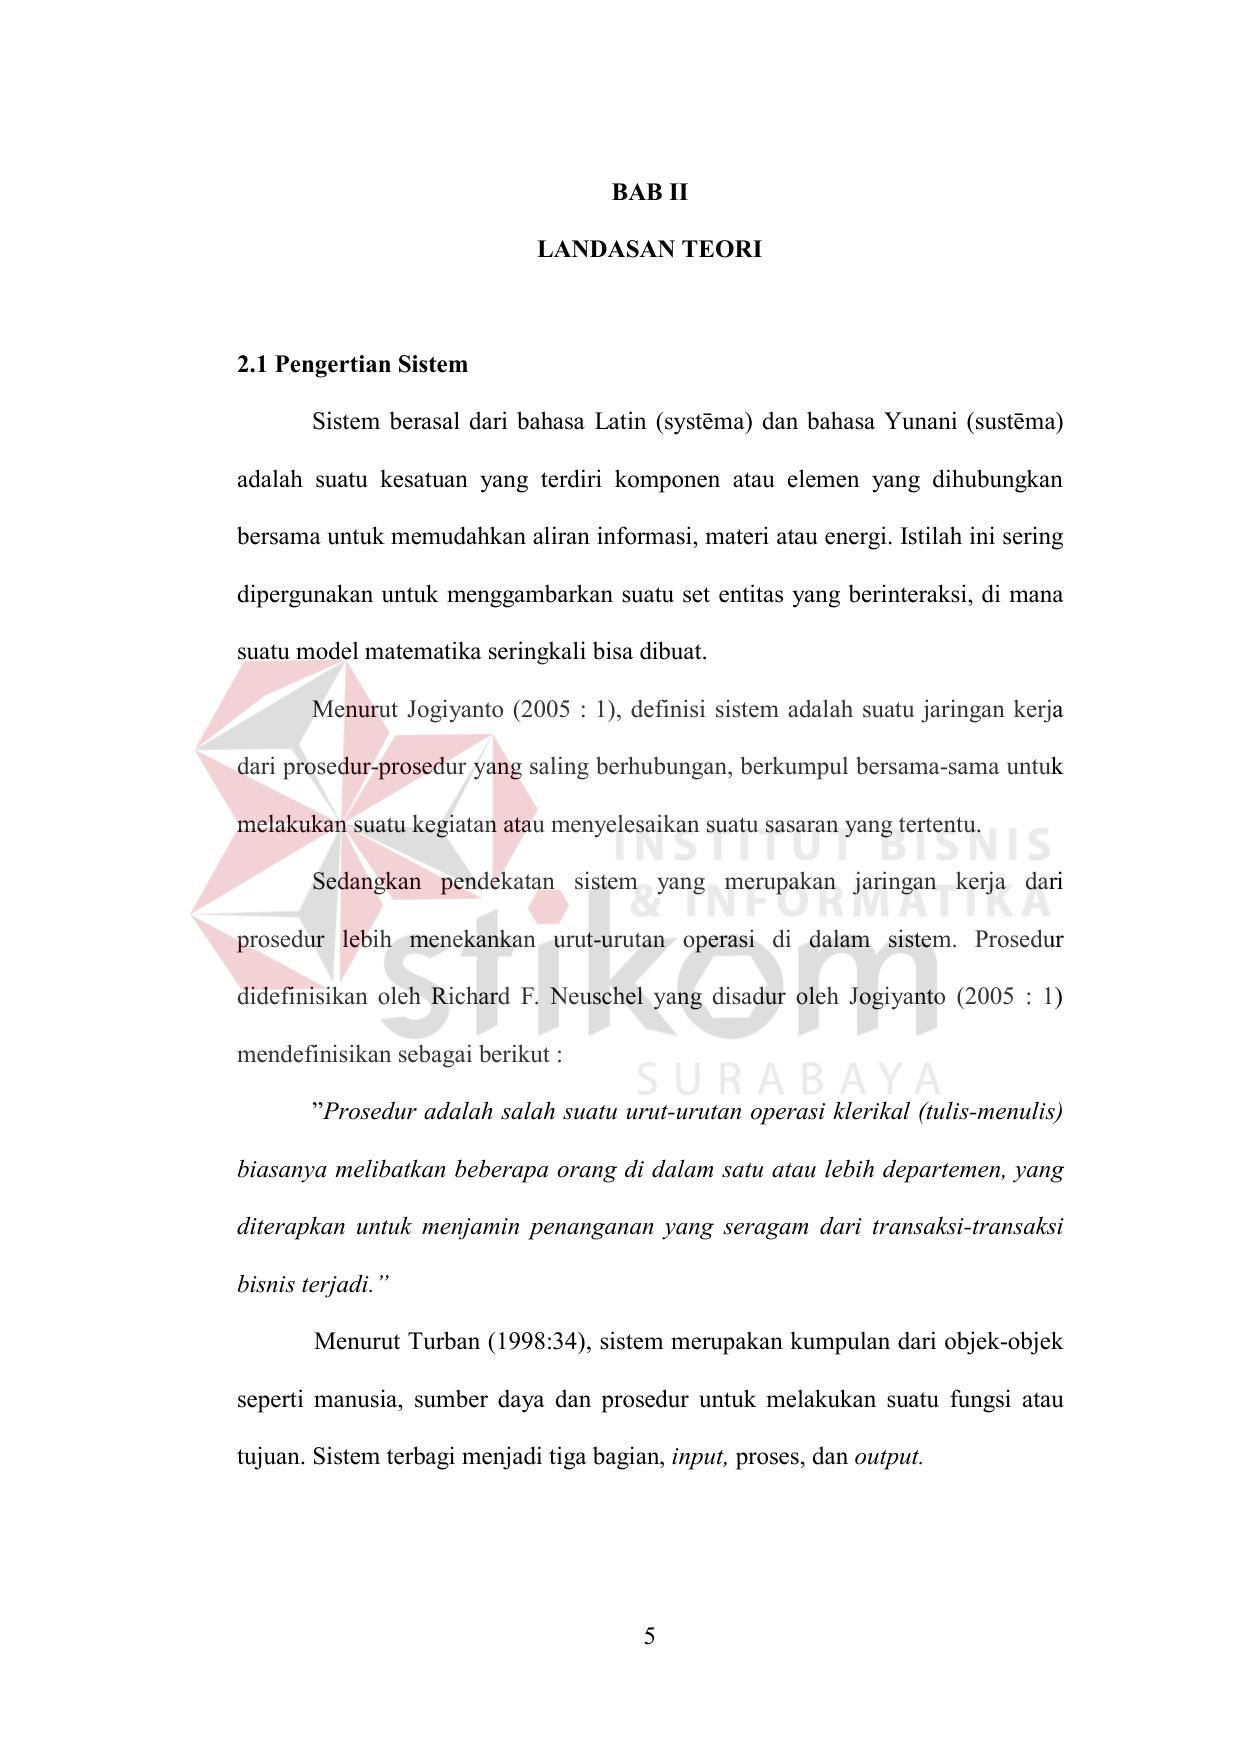 Bab ii landasan teori 21 pengertian sistem sistem berasal ccuart Image collections